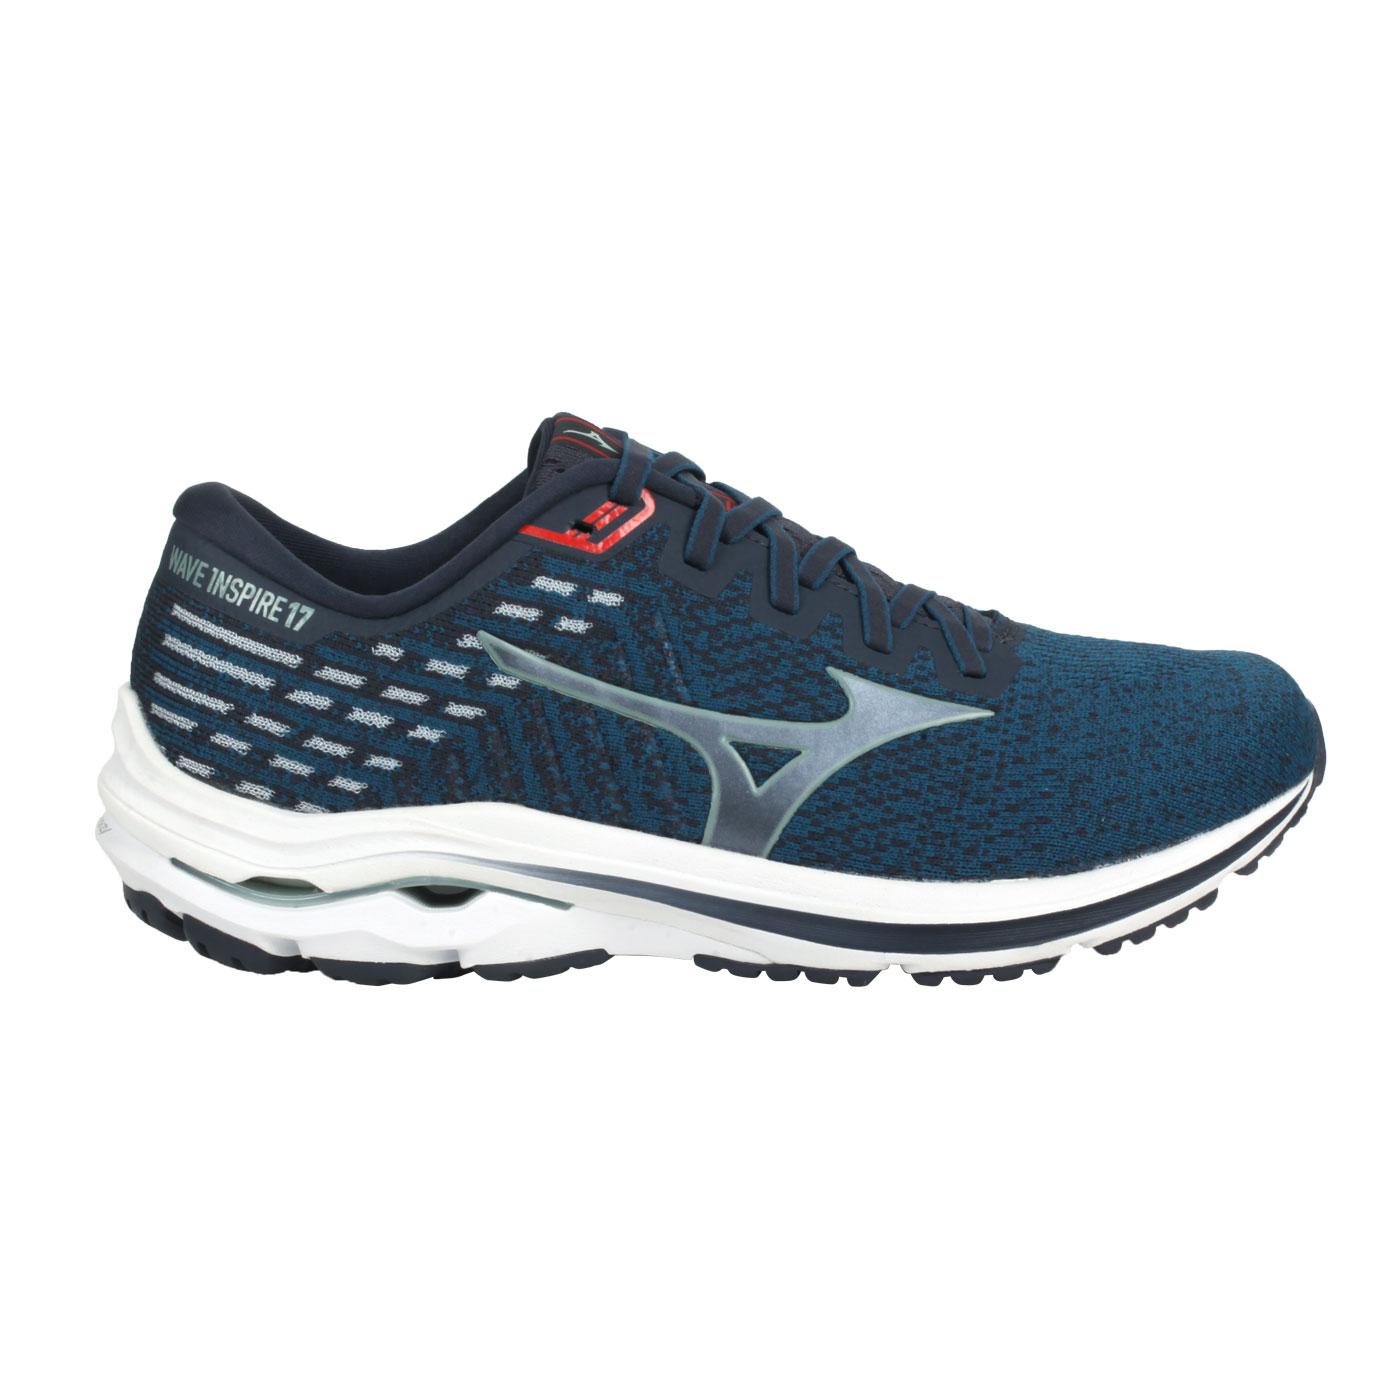 MIZUNO 男款慢跑鞋-4E  @WAVE INSPIRE 17 WAVEKNIT SW@J1GC212260 - 藍綠銀